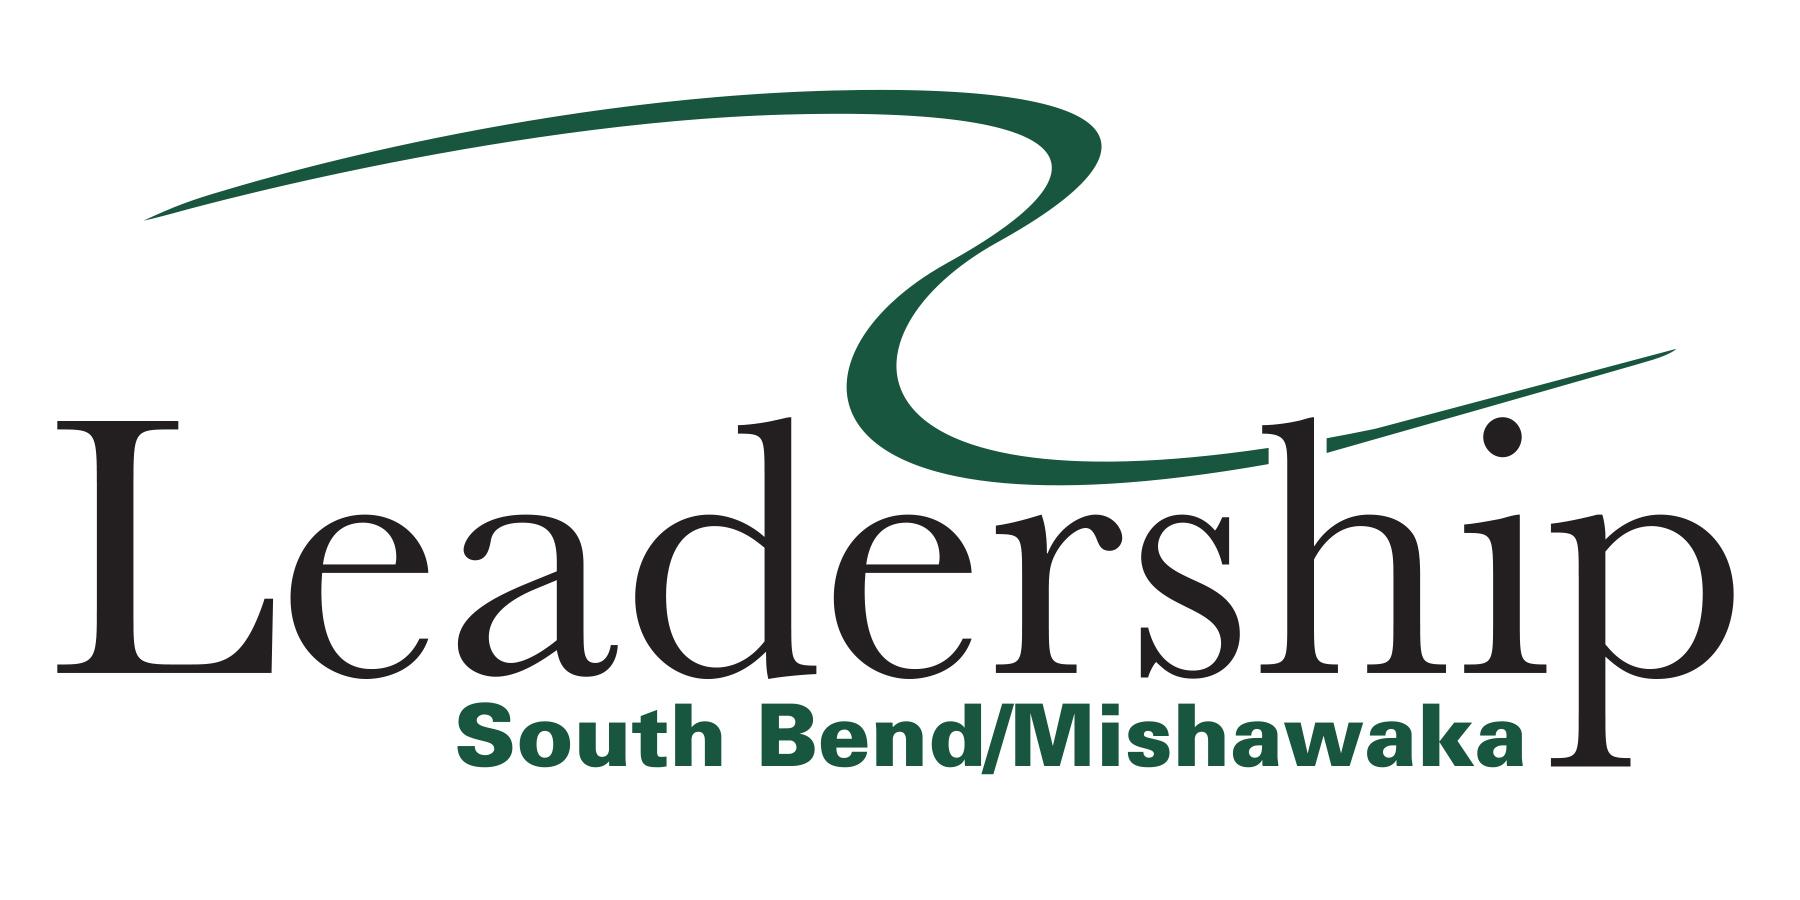 leadership south bend logo.jpg